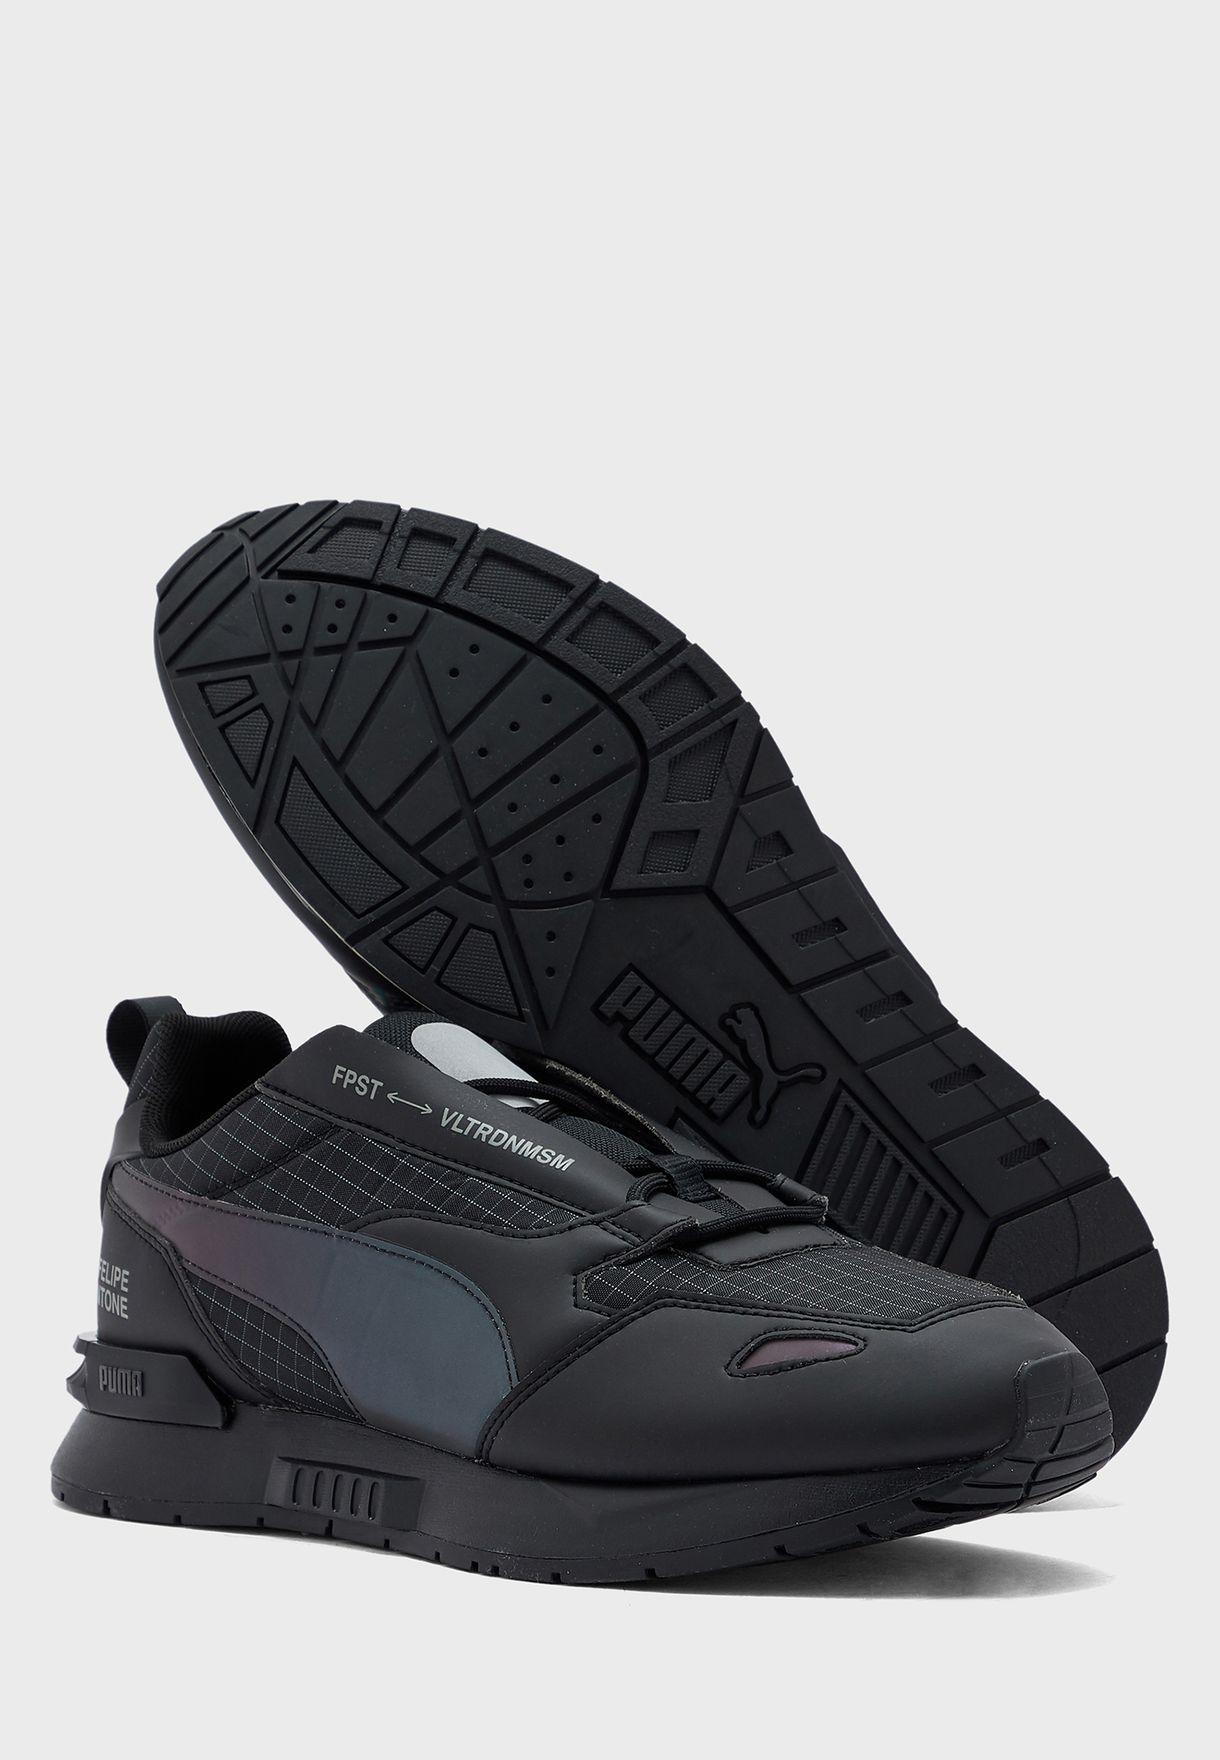 حذاء ميراج موكس تيك اف بي